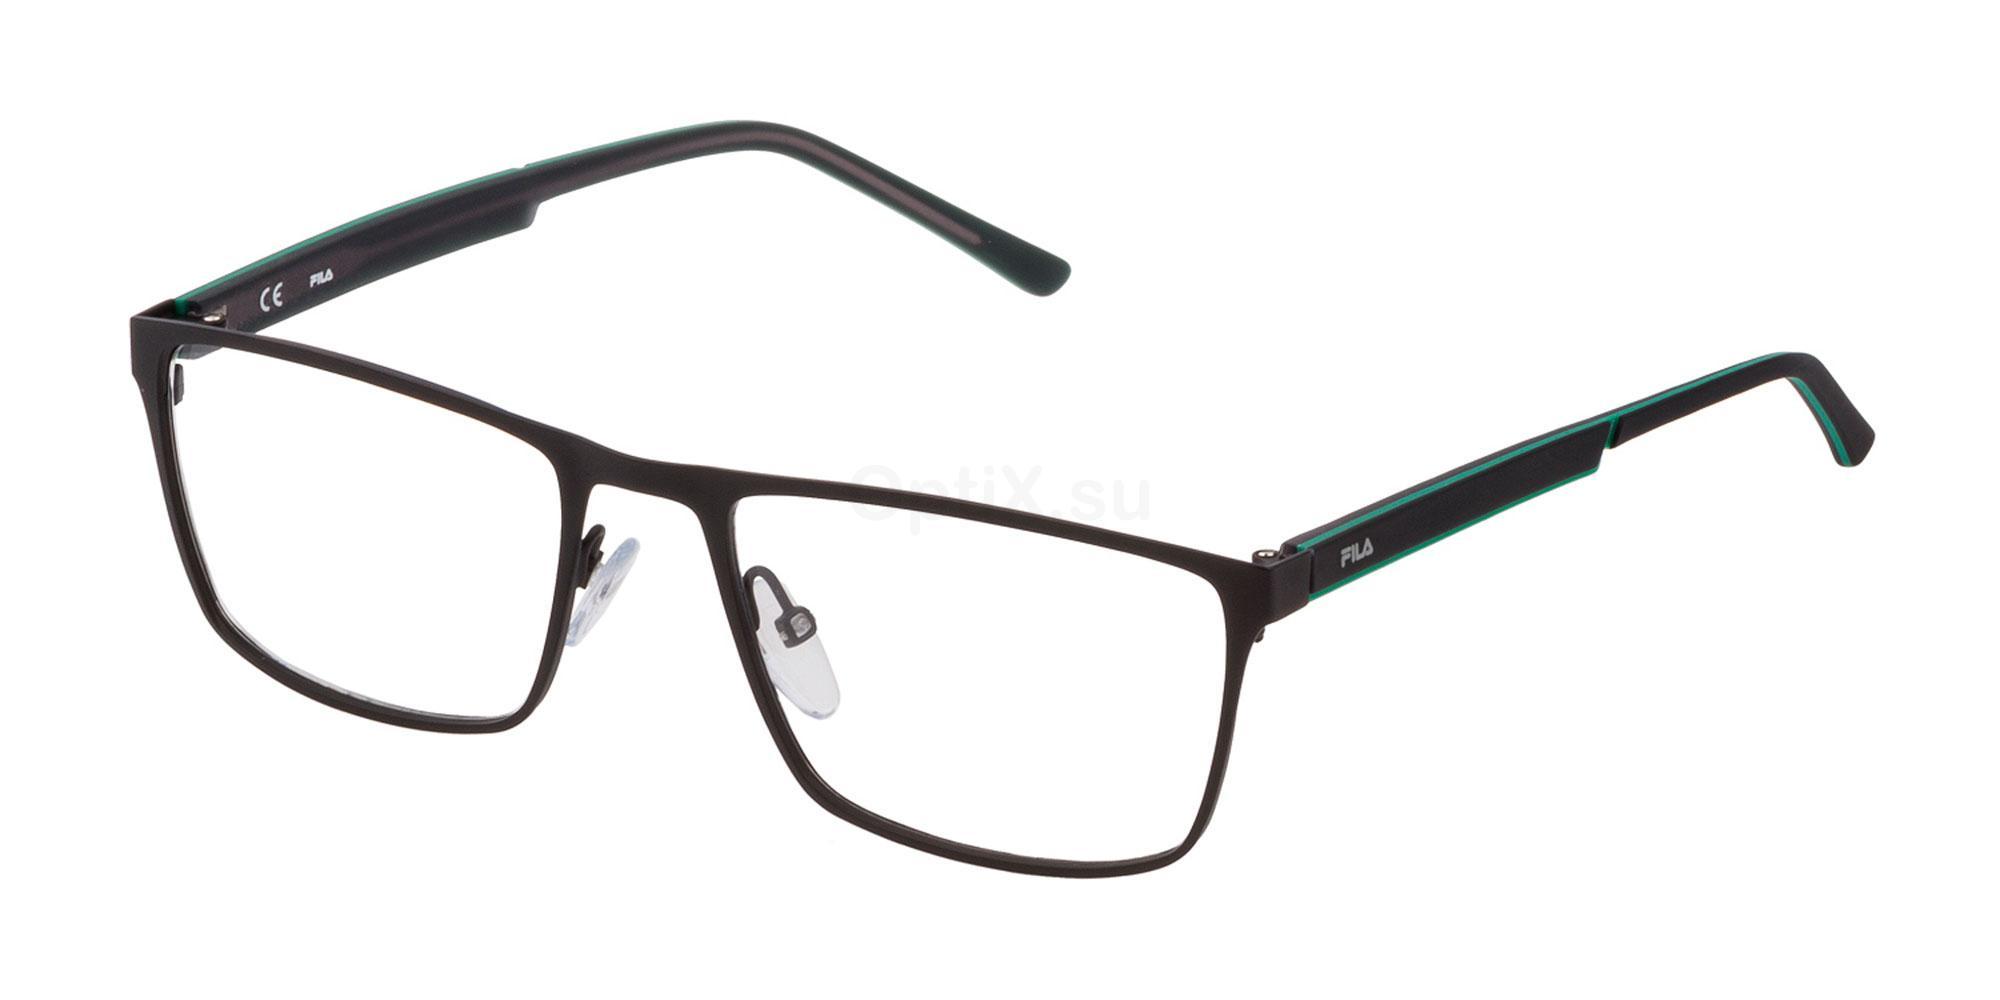 0531 VF9940 Glasses, Fila